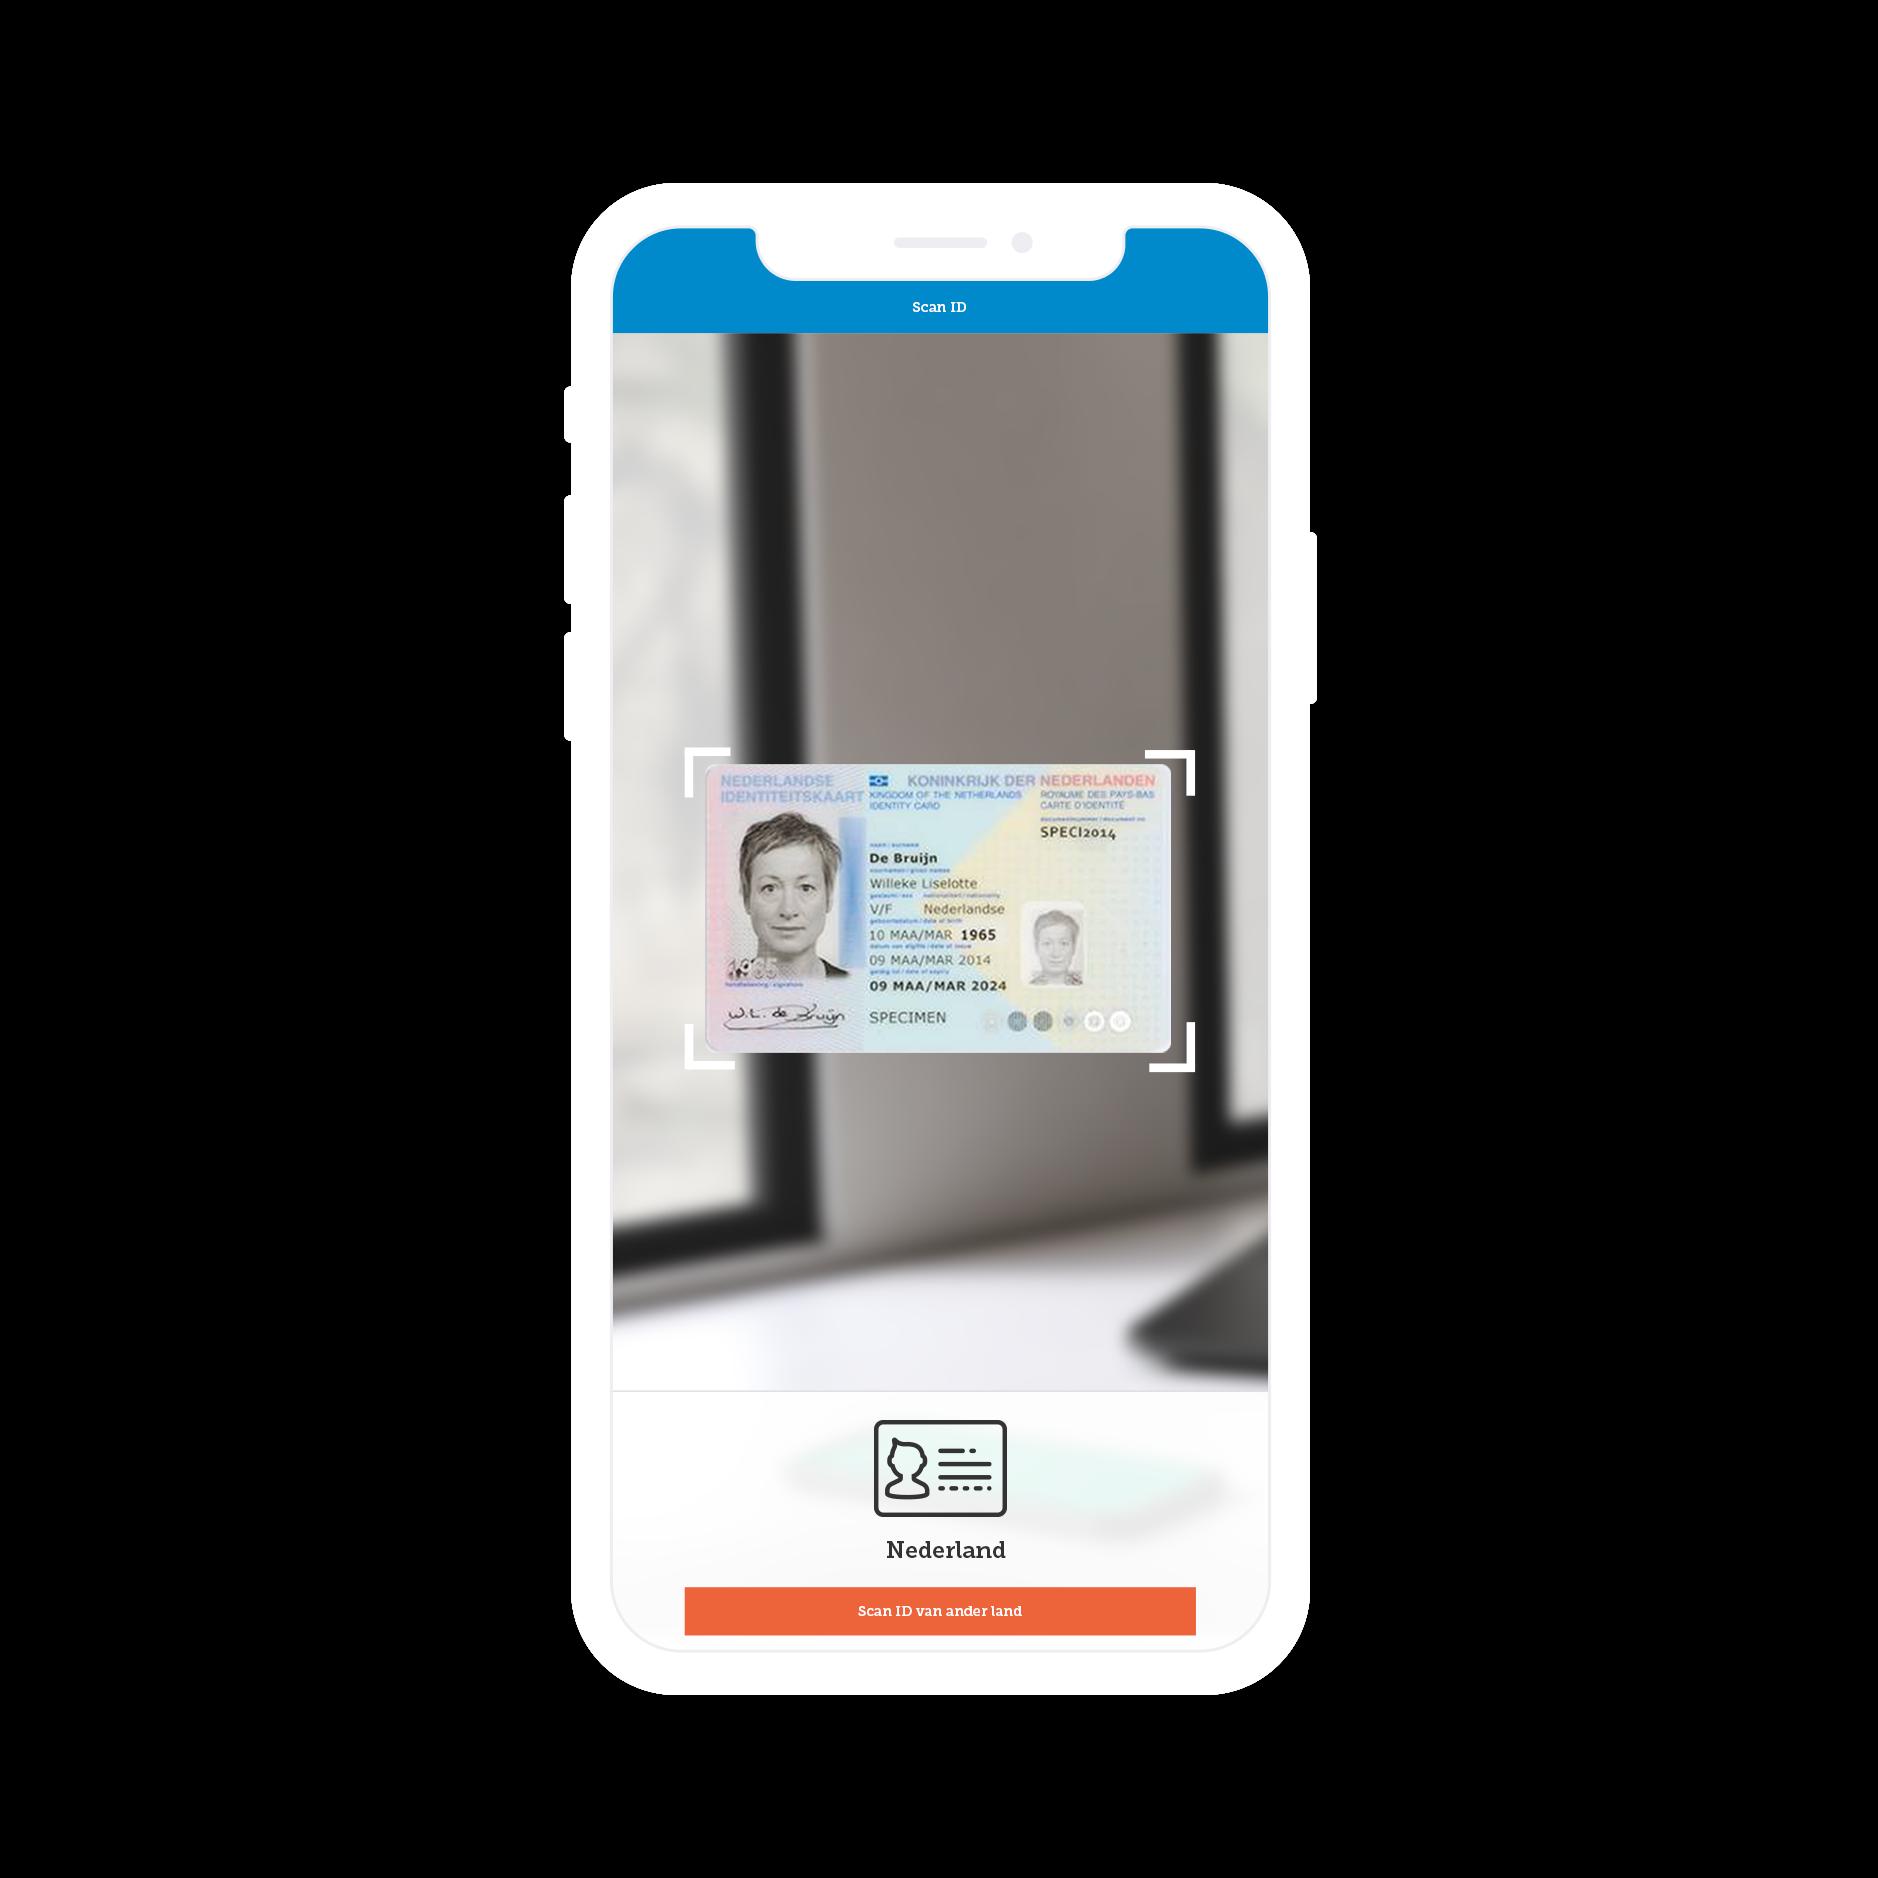 id-verificatie-start-scan